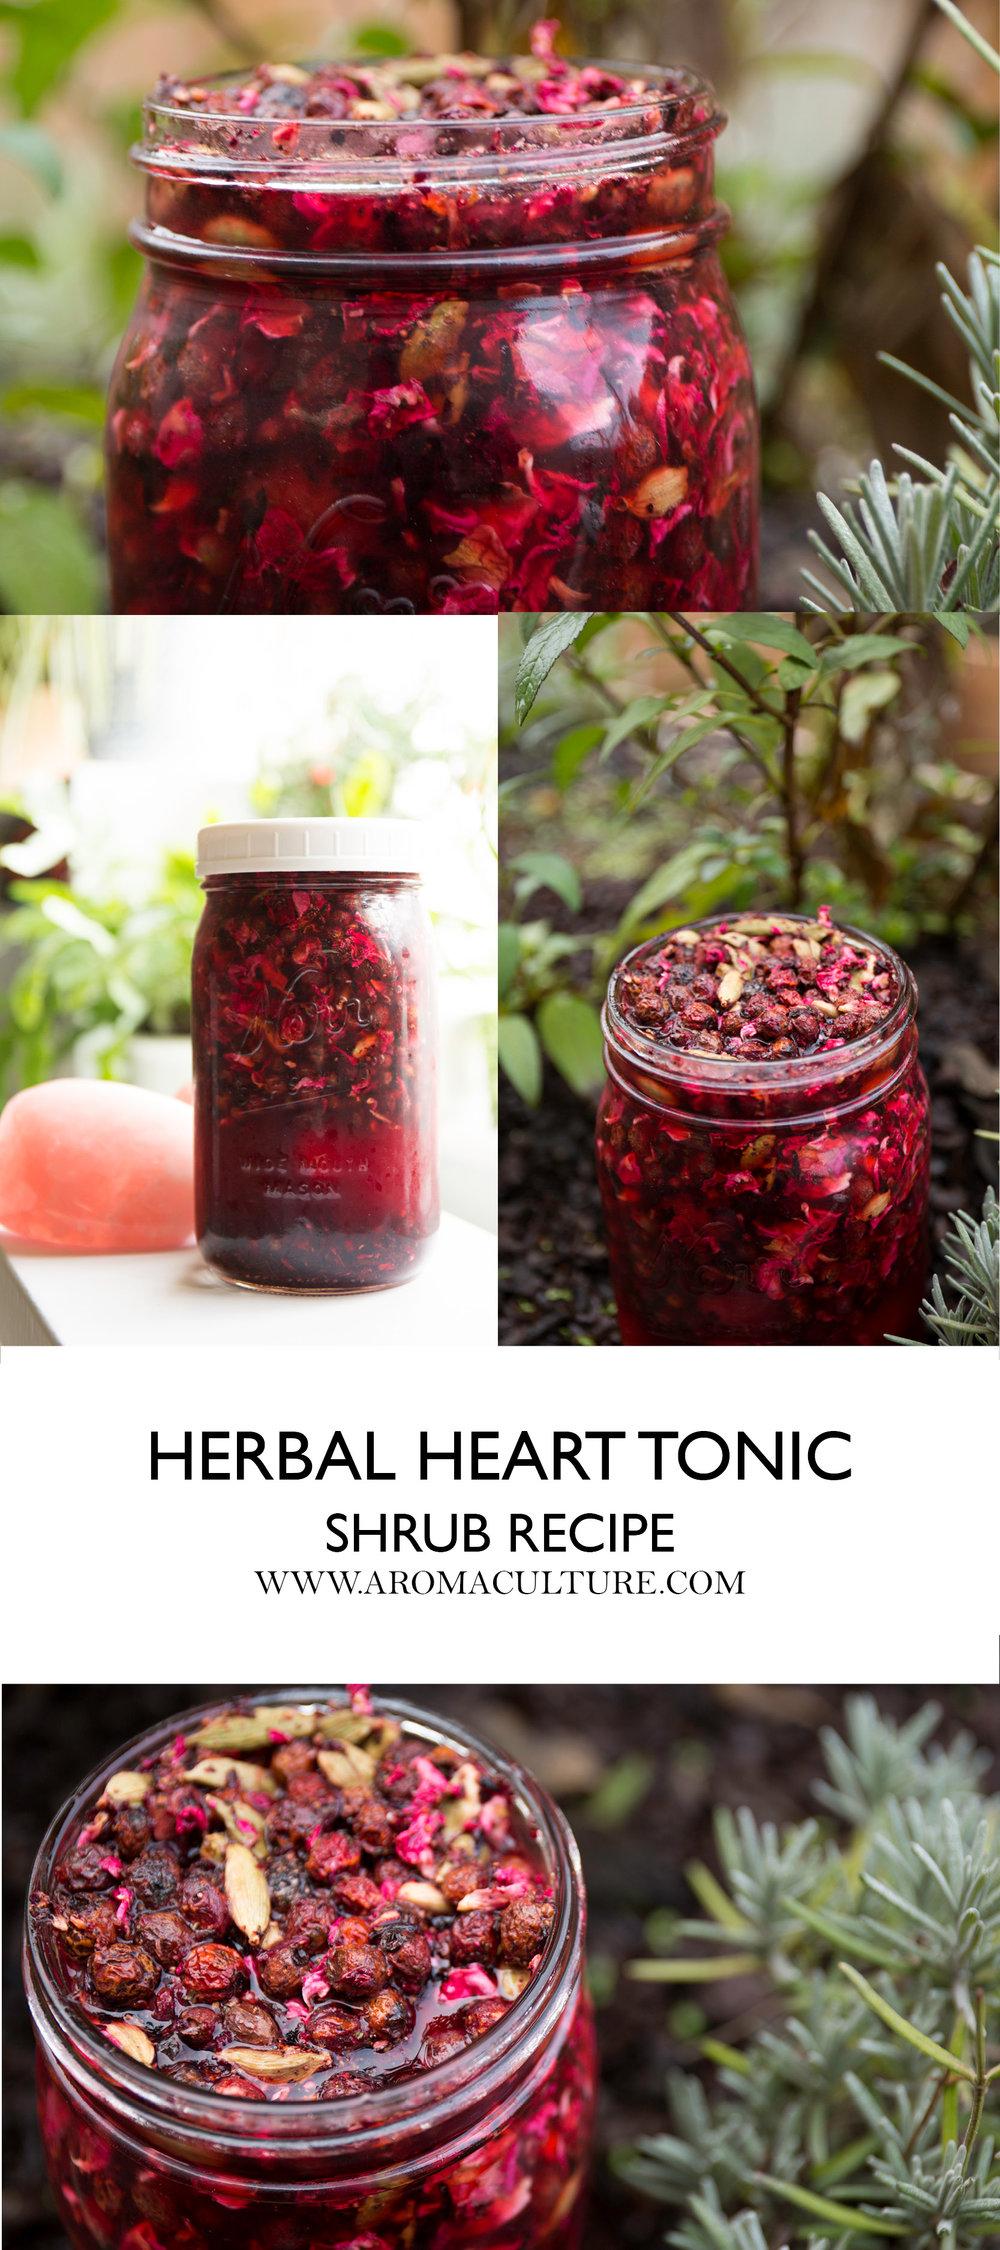 Herbal Heart Tonic Shrub Recipe – Floranella